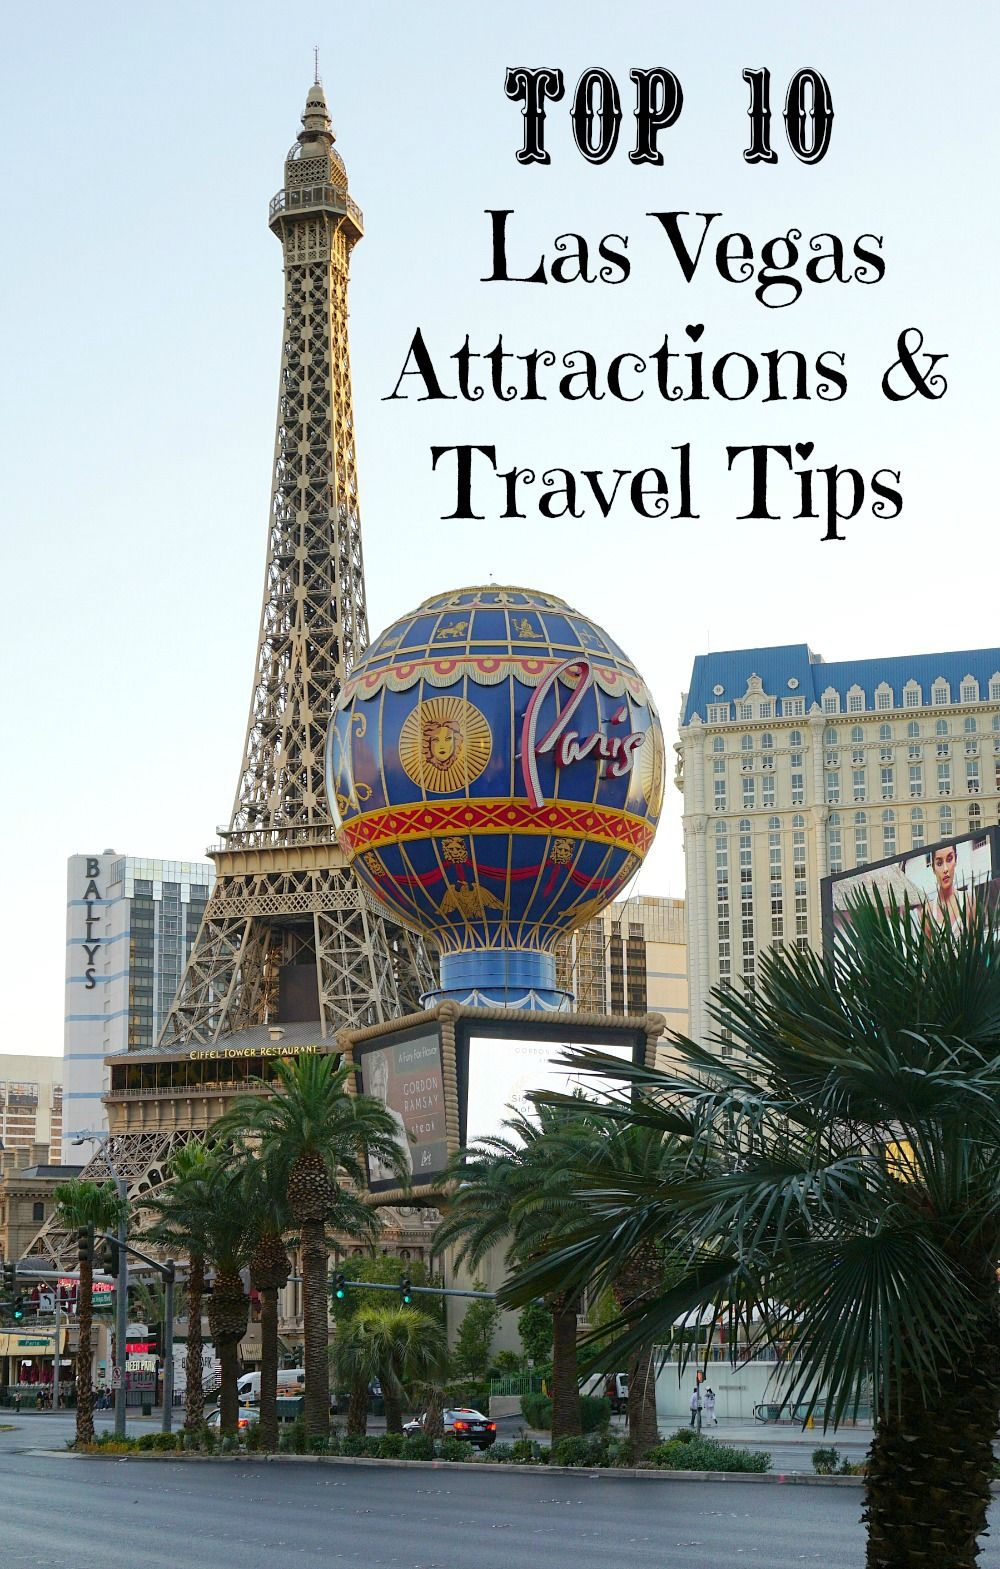 Las Vegas Attractions: Top Ten Las Vegas Attractions And Travel Tips